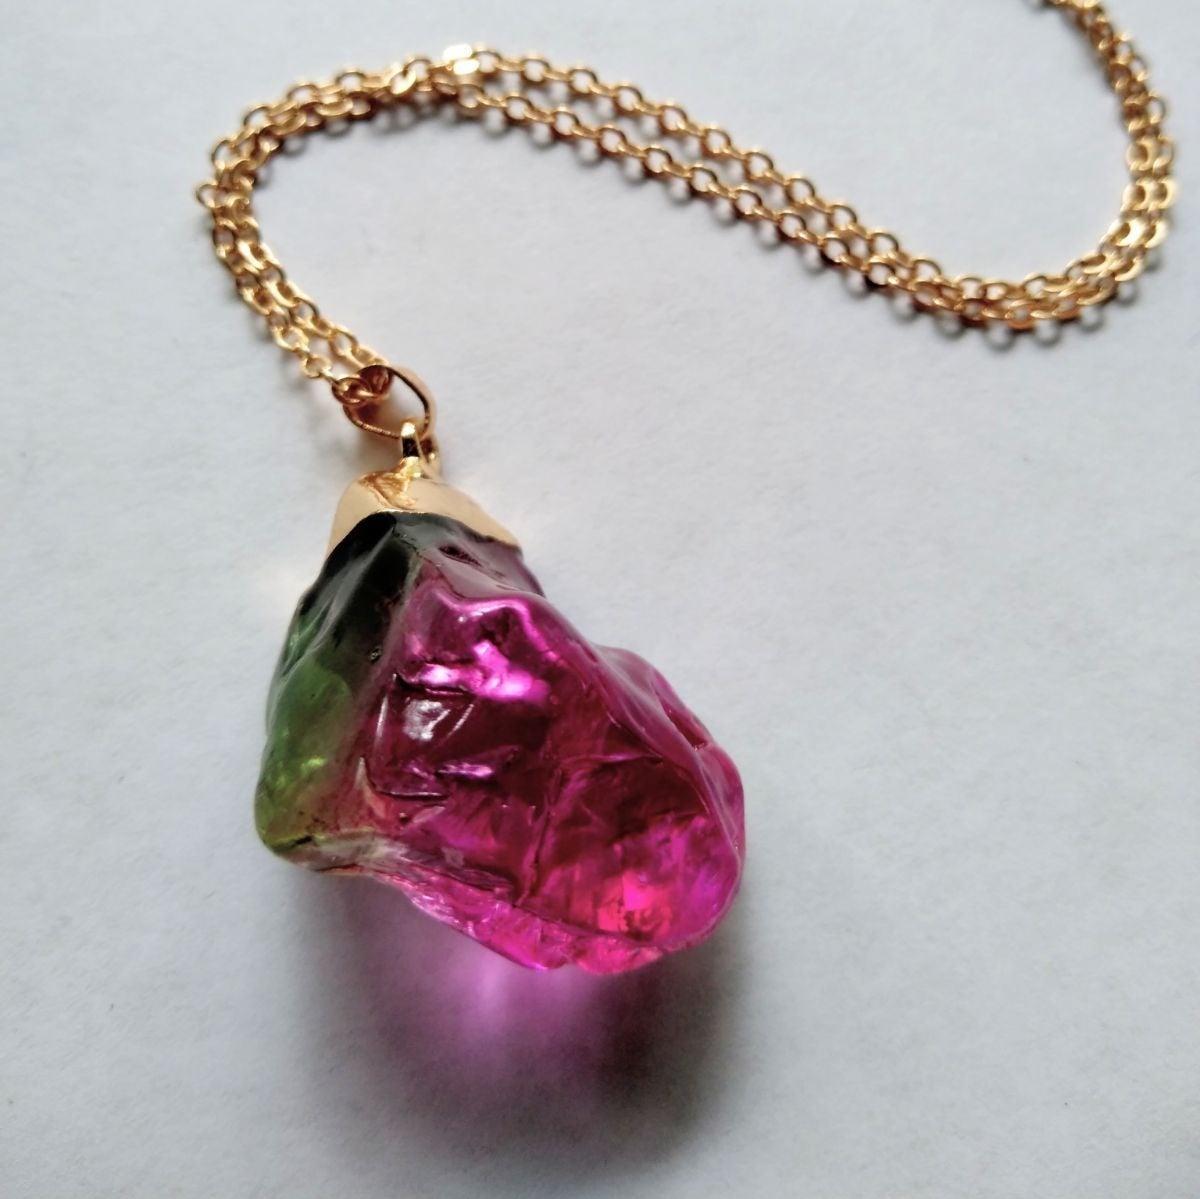 Watermelon Quartz Crystal Stone Necklace